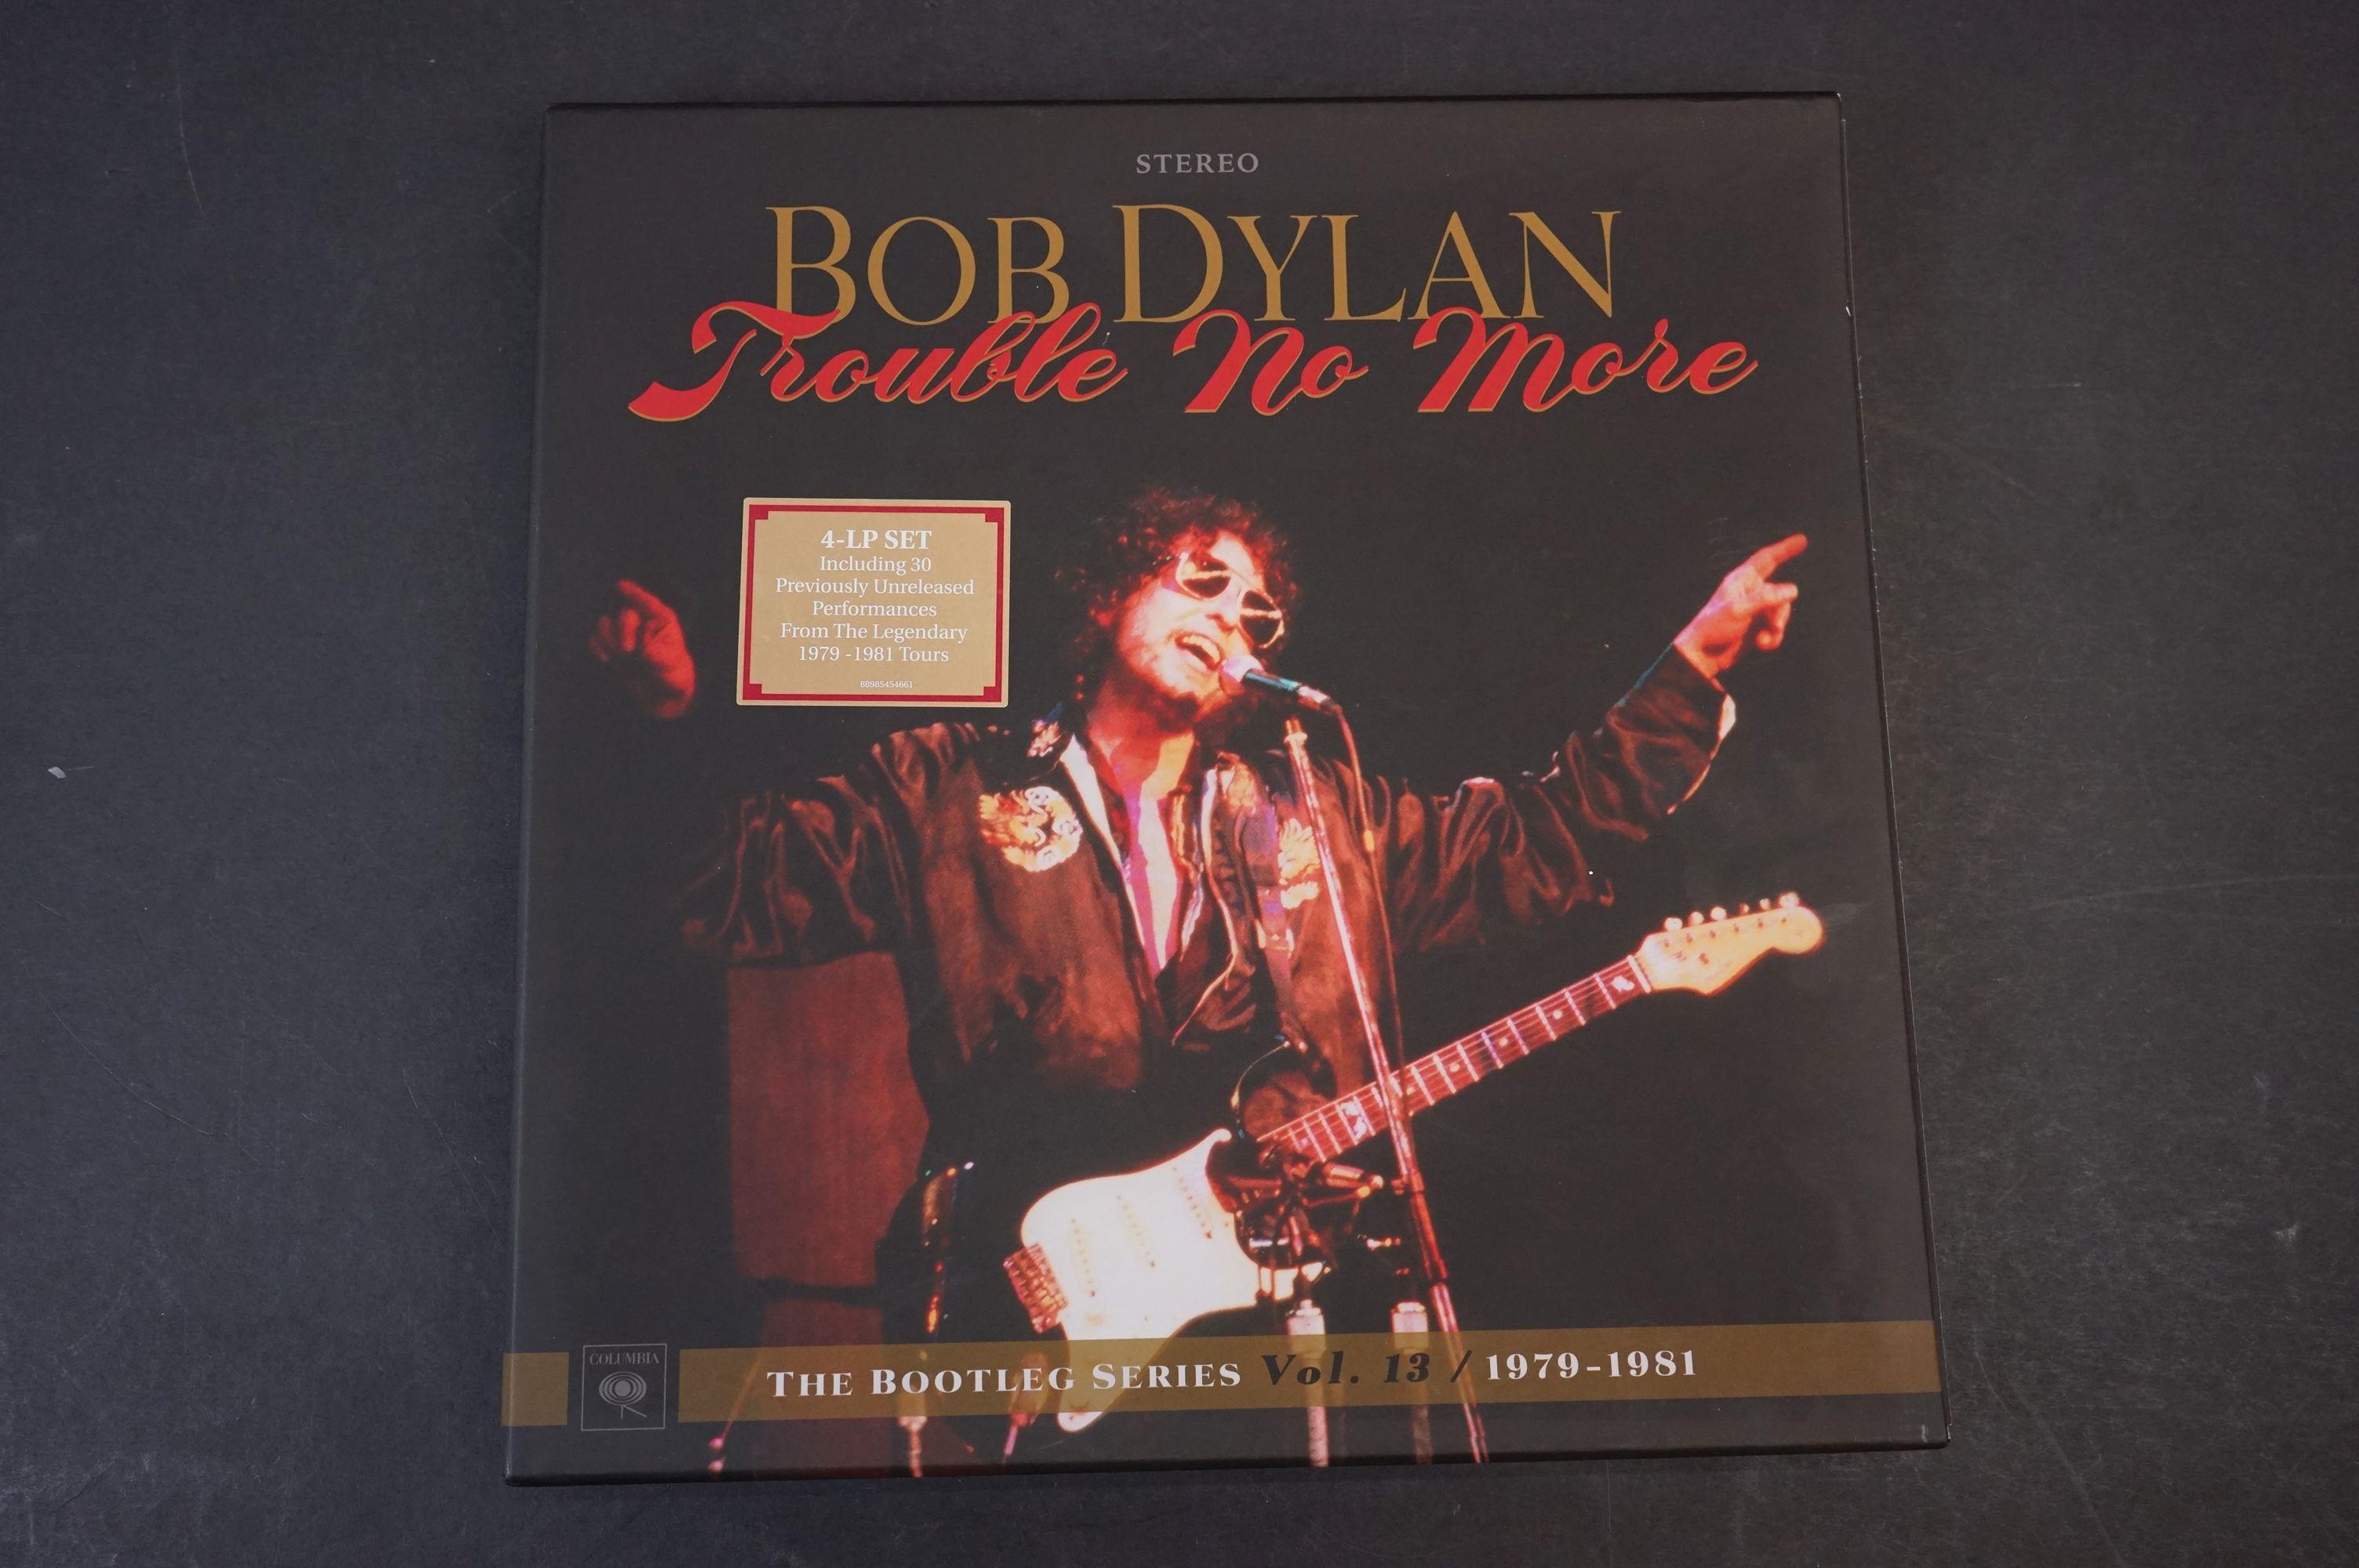 Vinyl - Bob Dylan Trouble No More The Bootleg Series vol 13 1979-1981 4 LP Box Set, ex